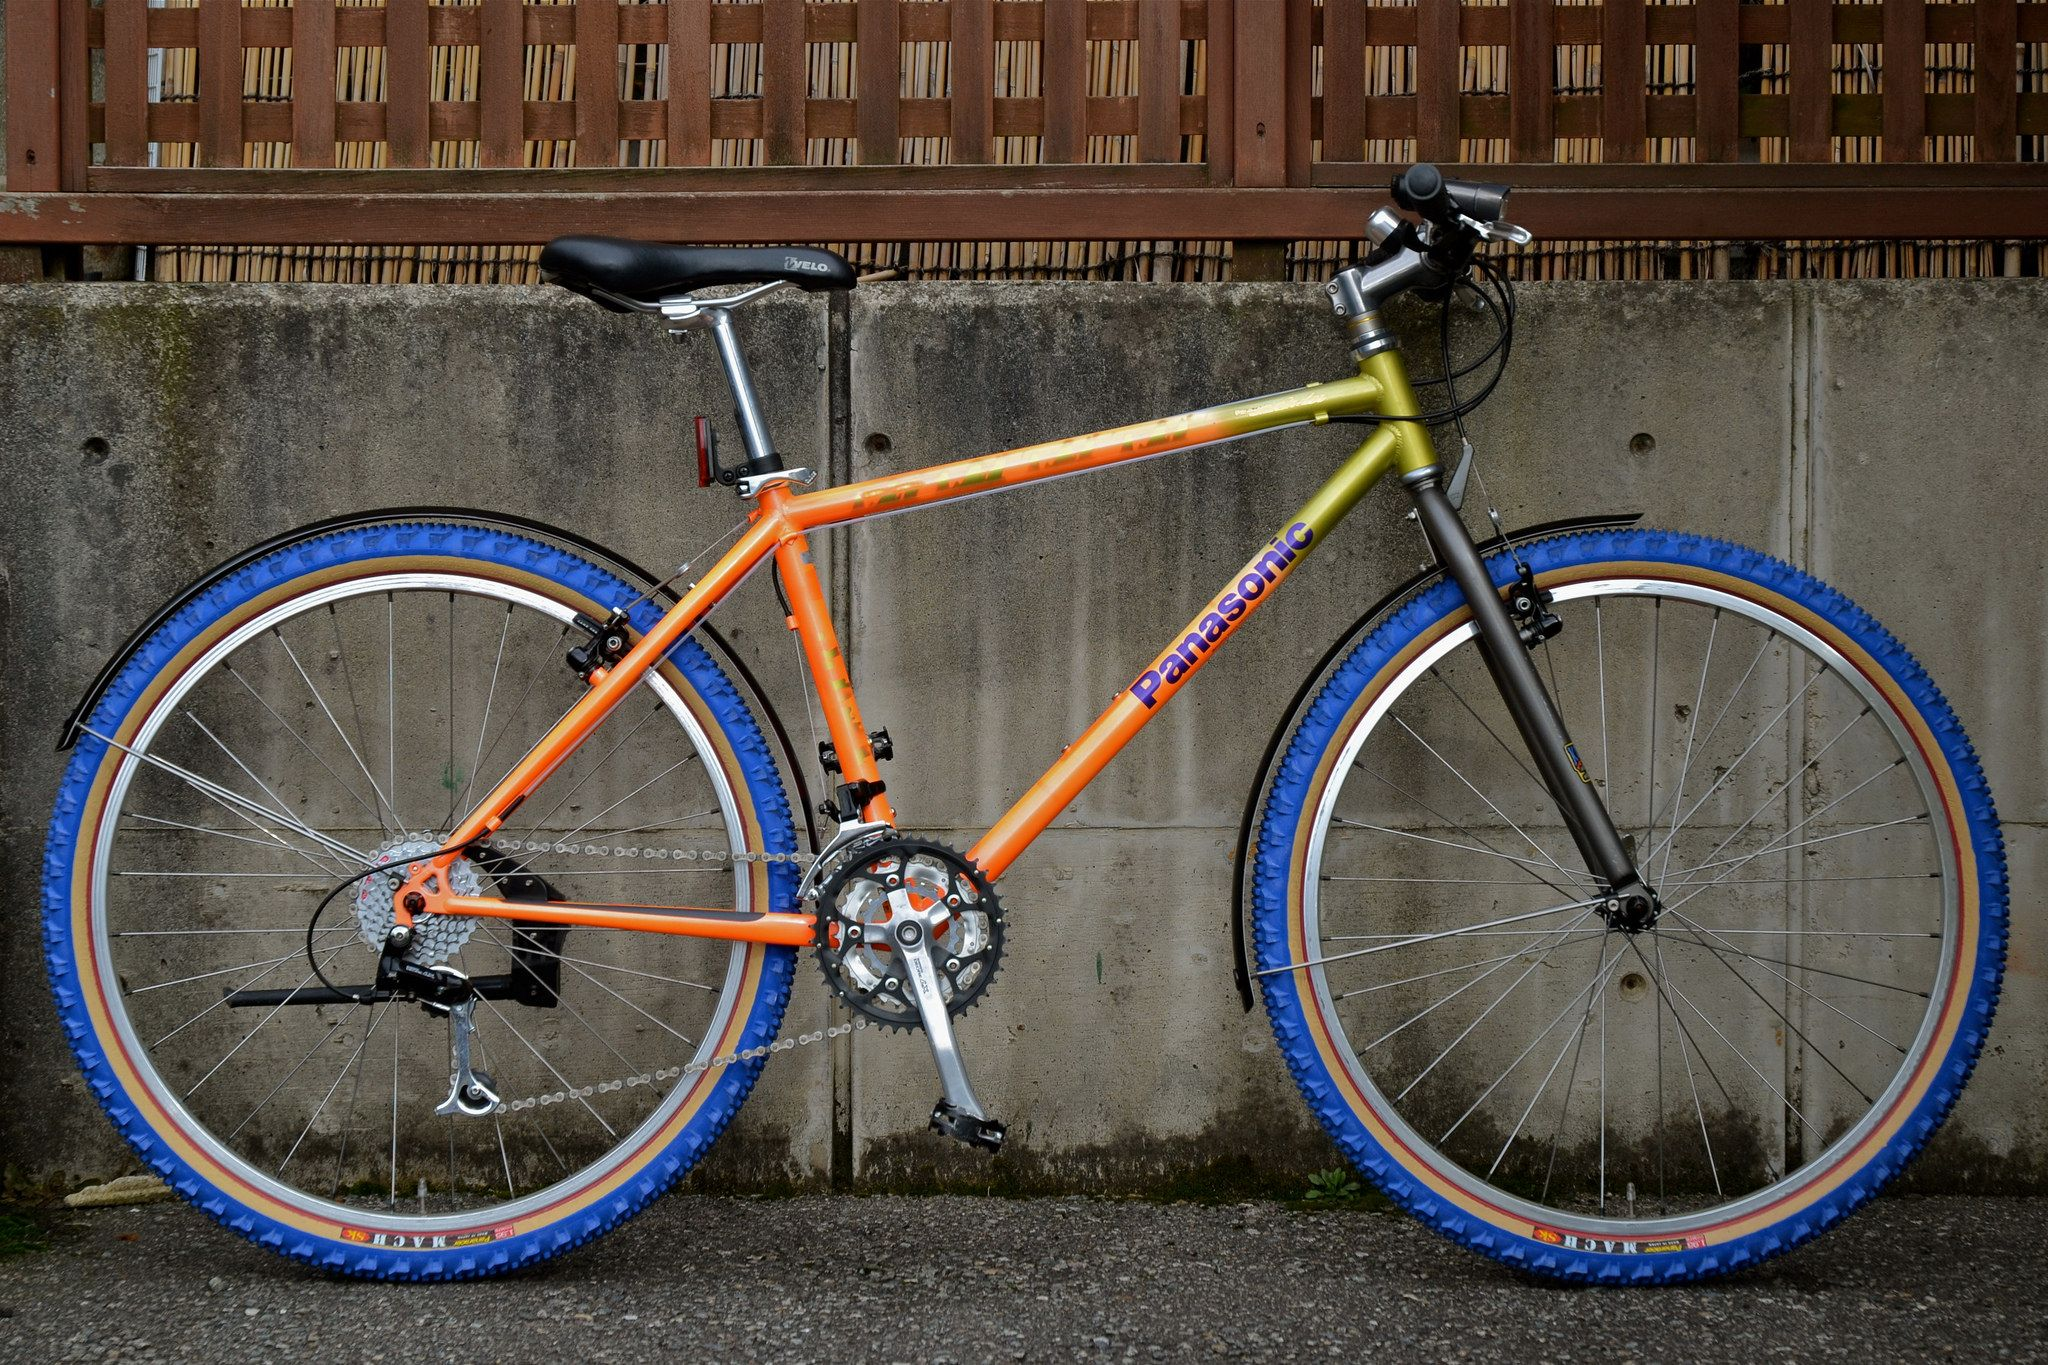 panasonic mtb   MTB, Bike stuff and Bicycling